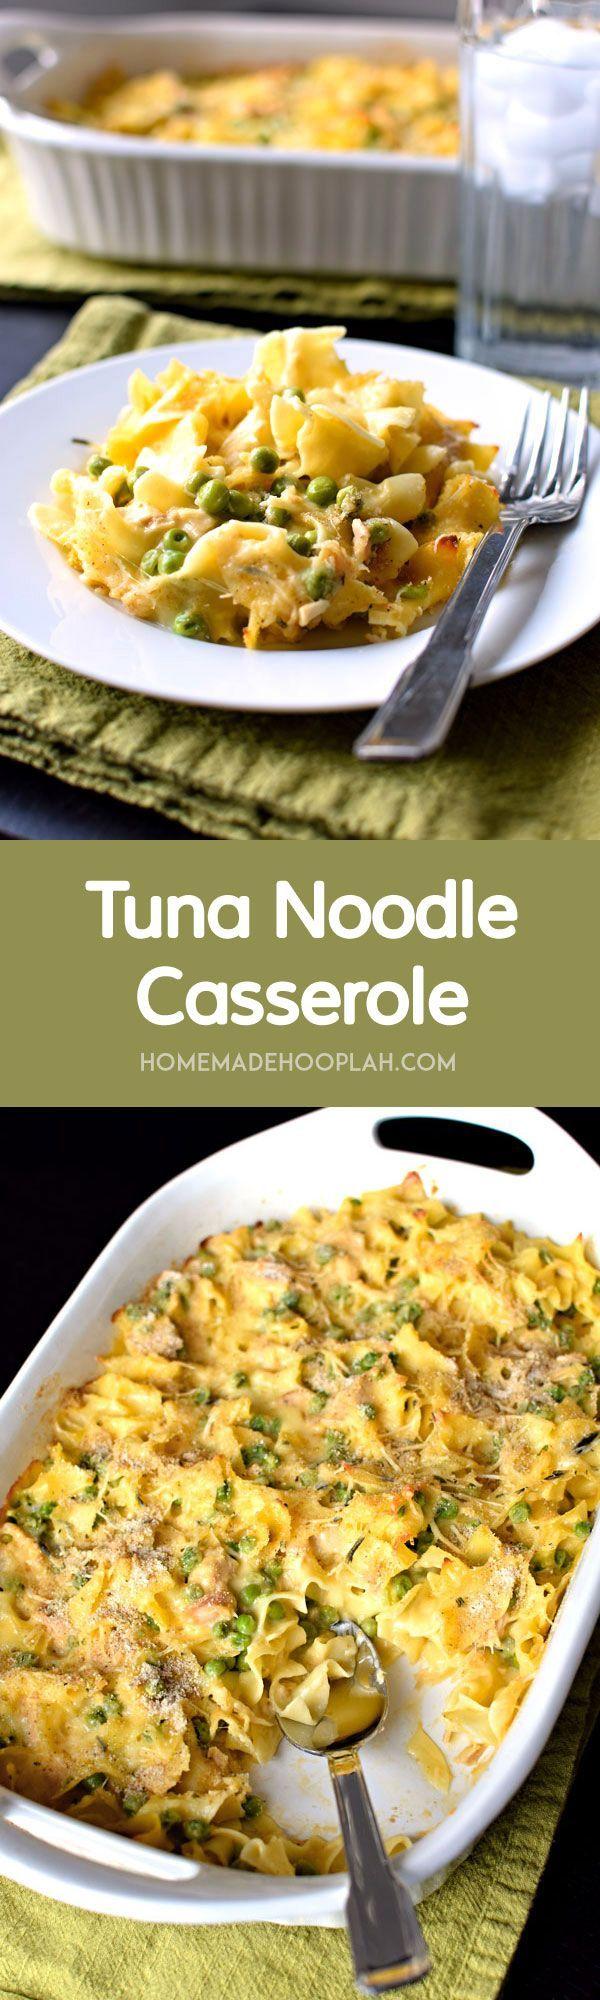 Tuna Noodle Casserole! Creamy cheesy sauce with tuna, veggies, and soft egg noodles. | HomemadeHooplah.com